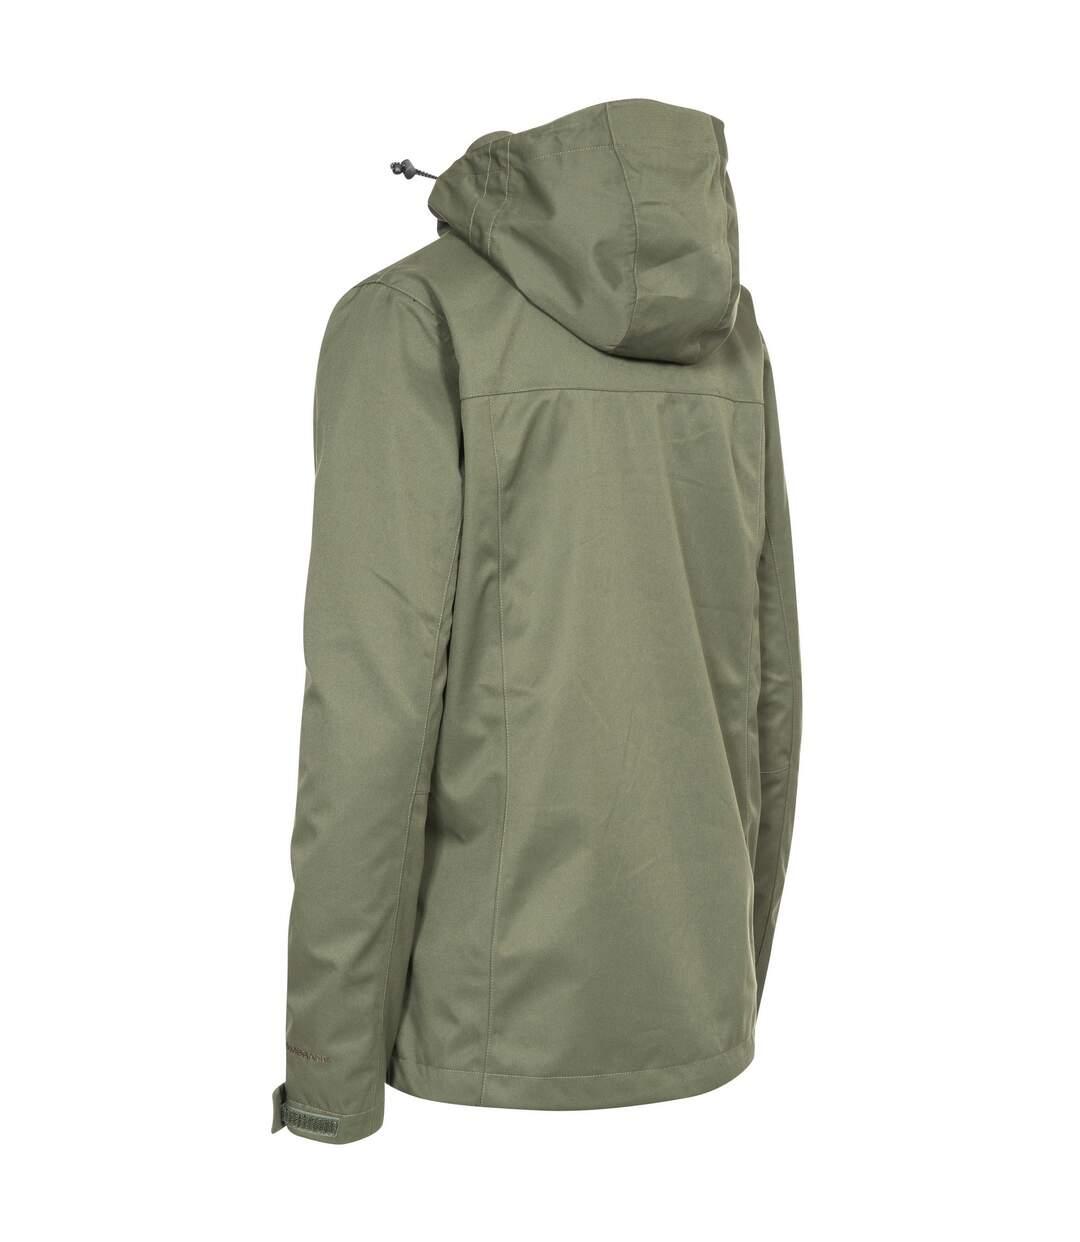 Trespass Womens/Ladies Emeson DLX Hooded Waterproof Jacket (Moss) - UTTP4189